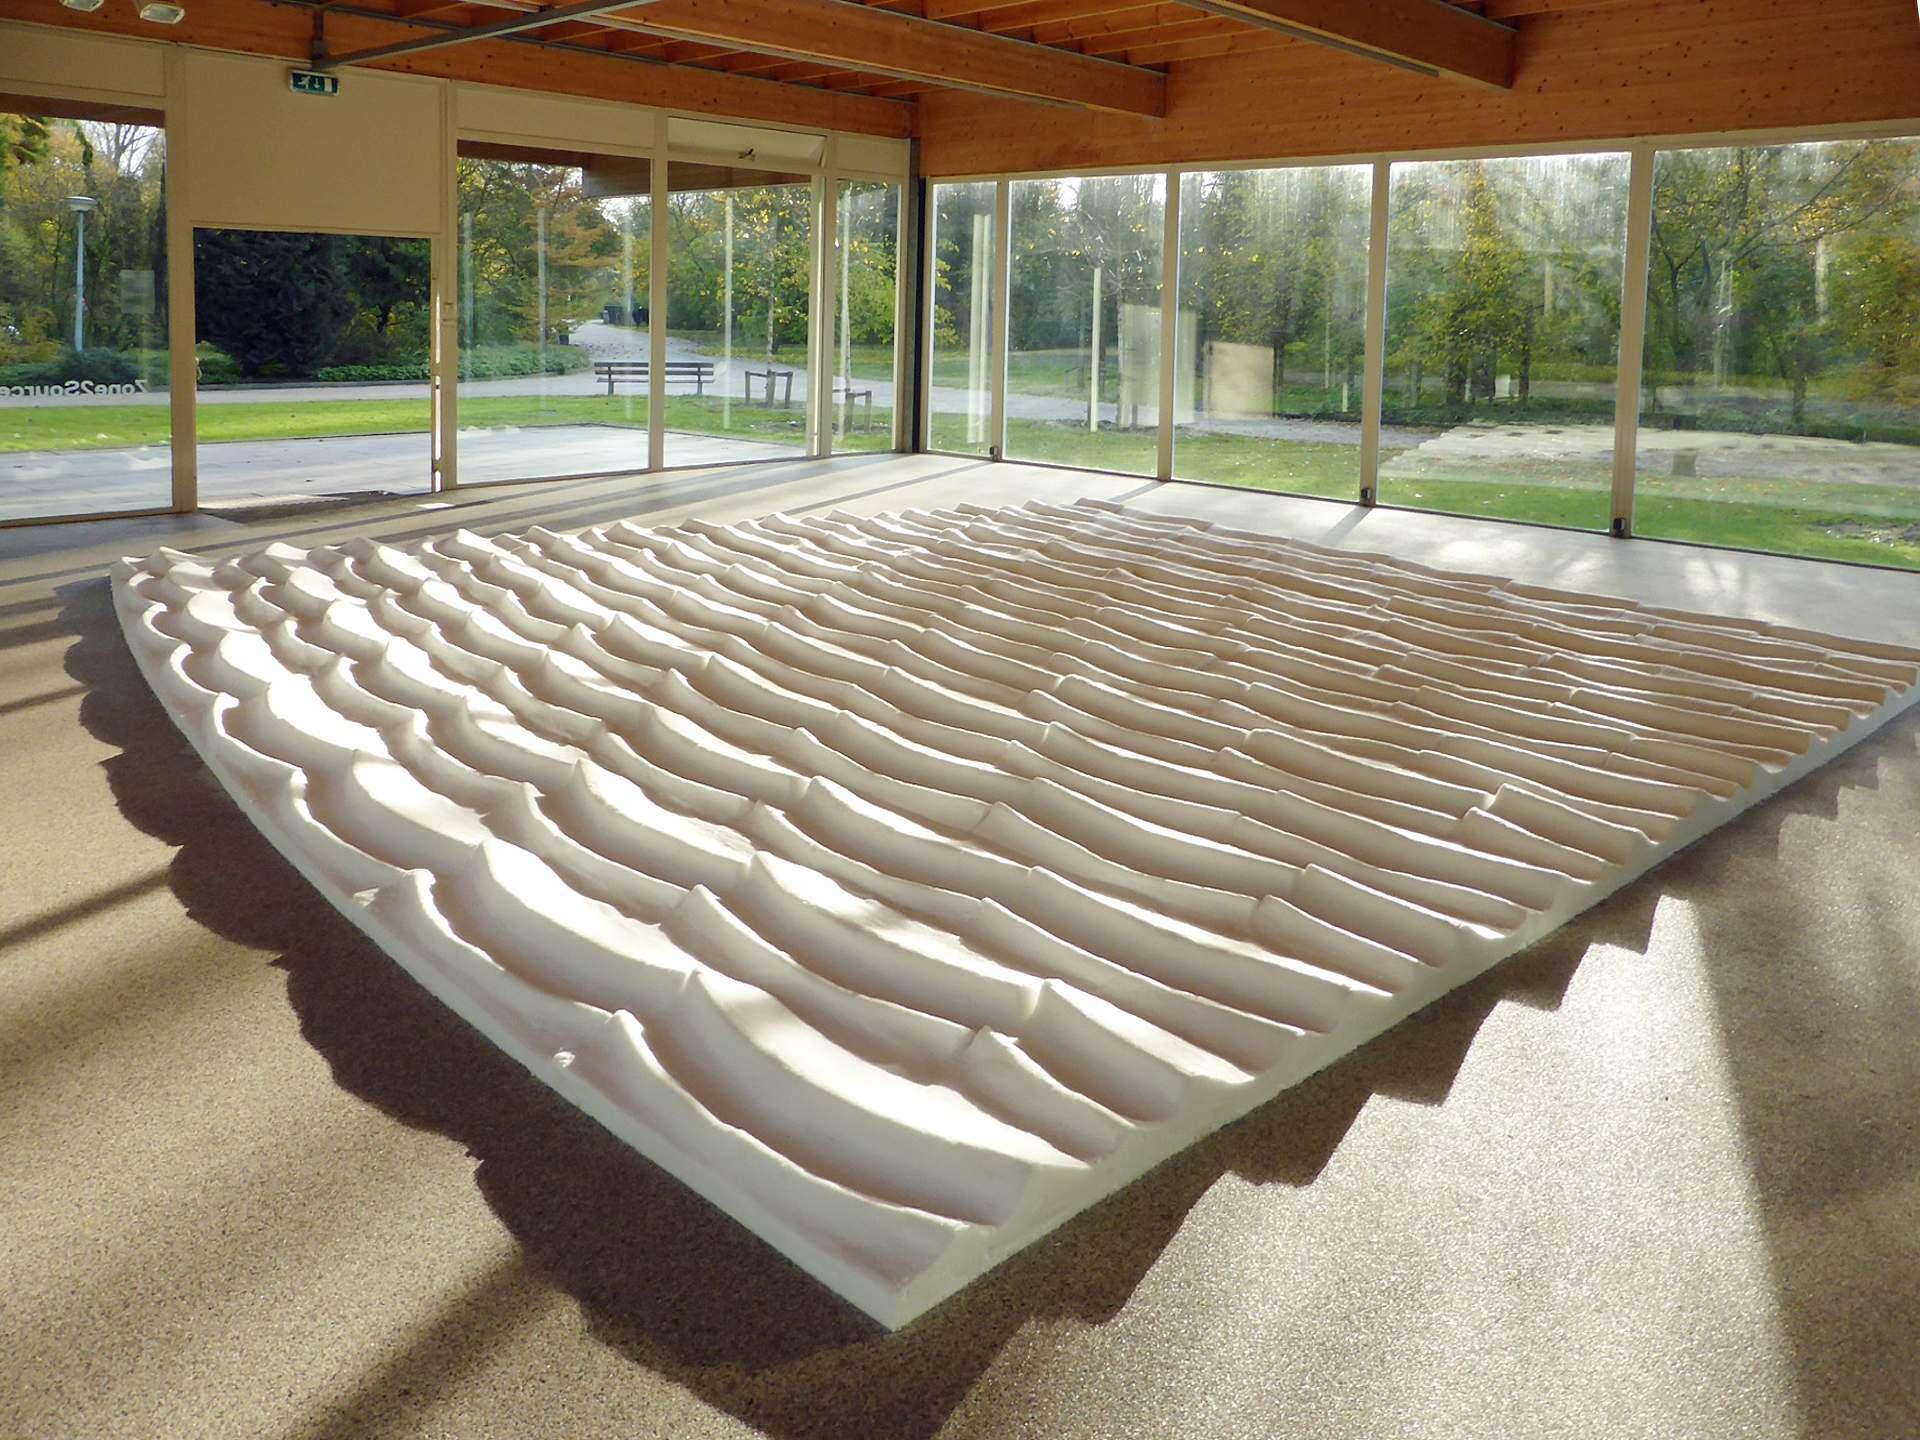 Salina - ephemeral art installation made of salt